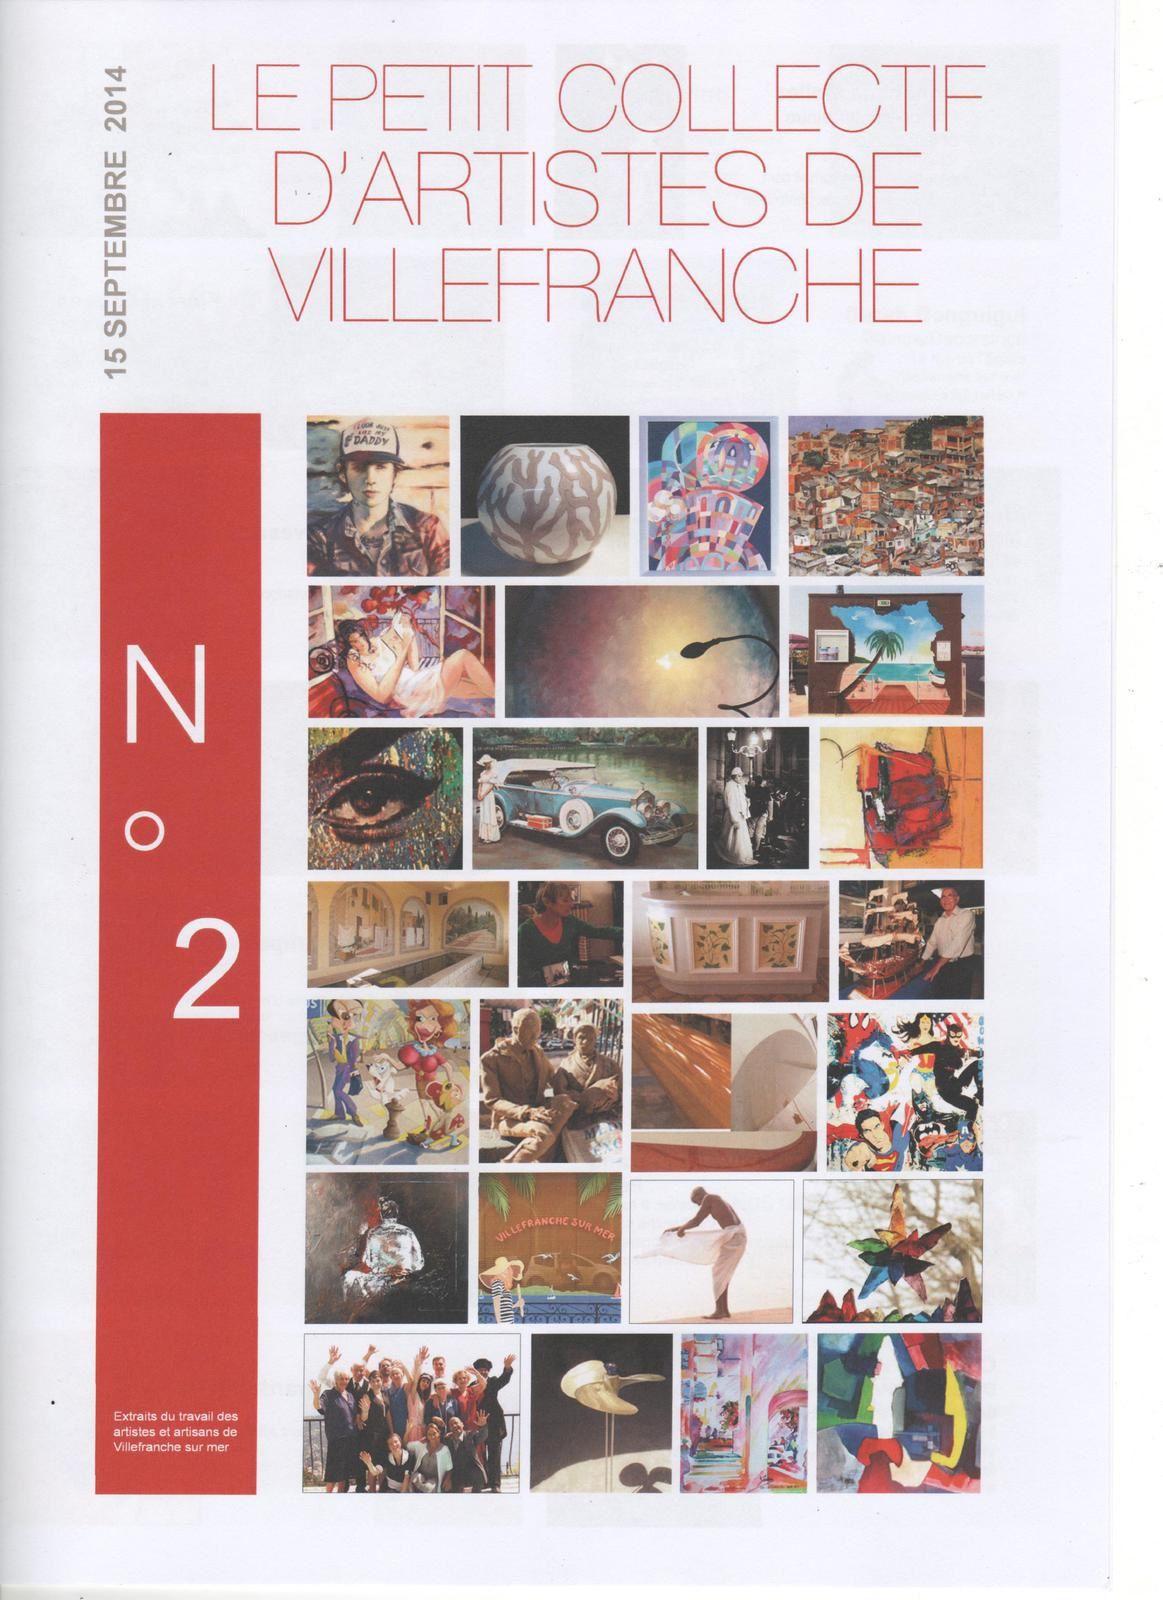 Collectif des Artistes Artisans de Villefranche sur Mer